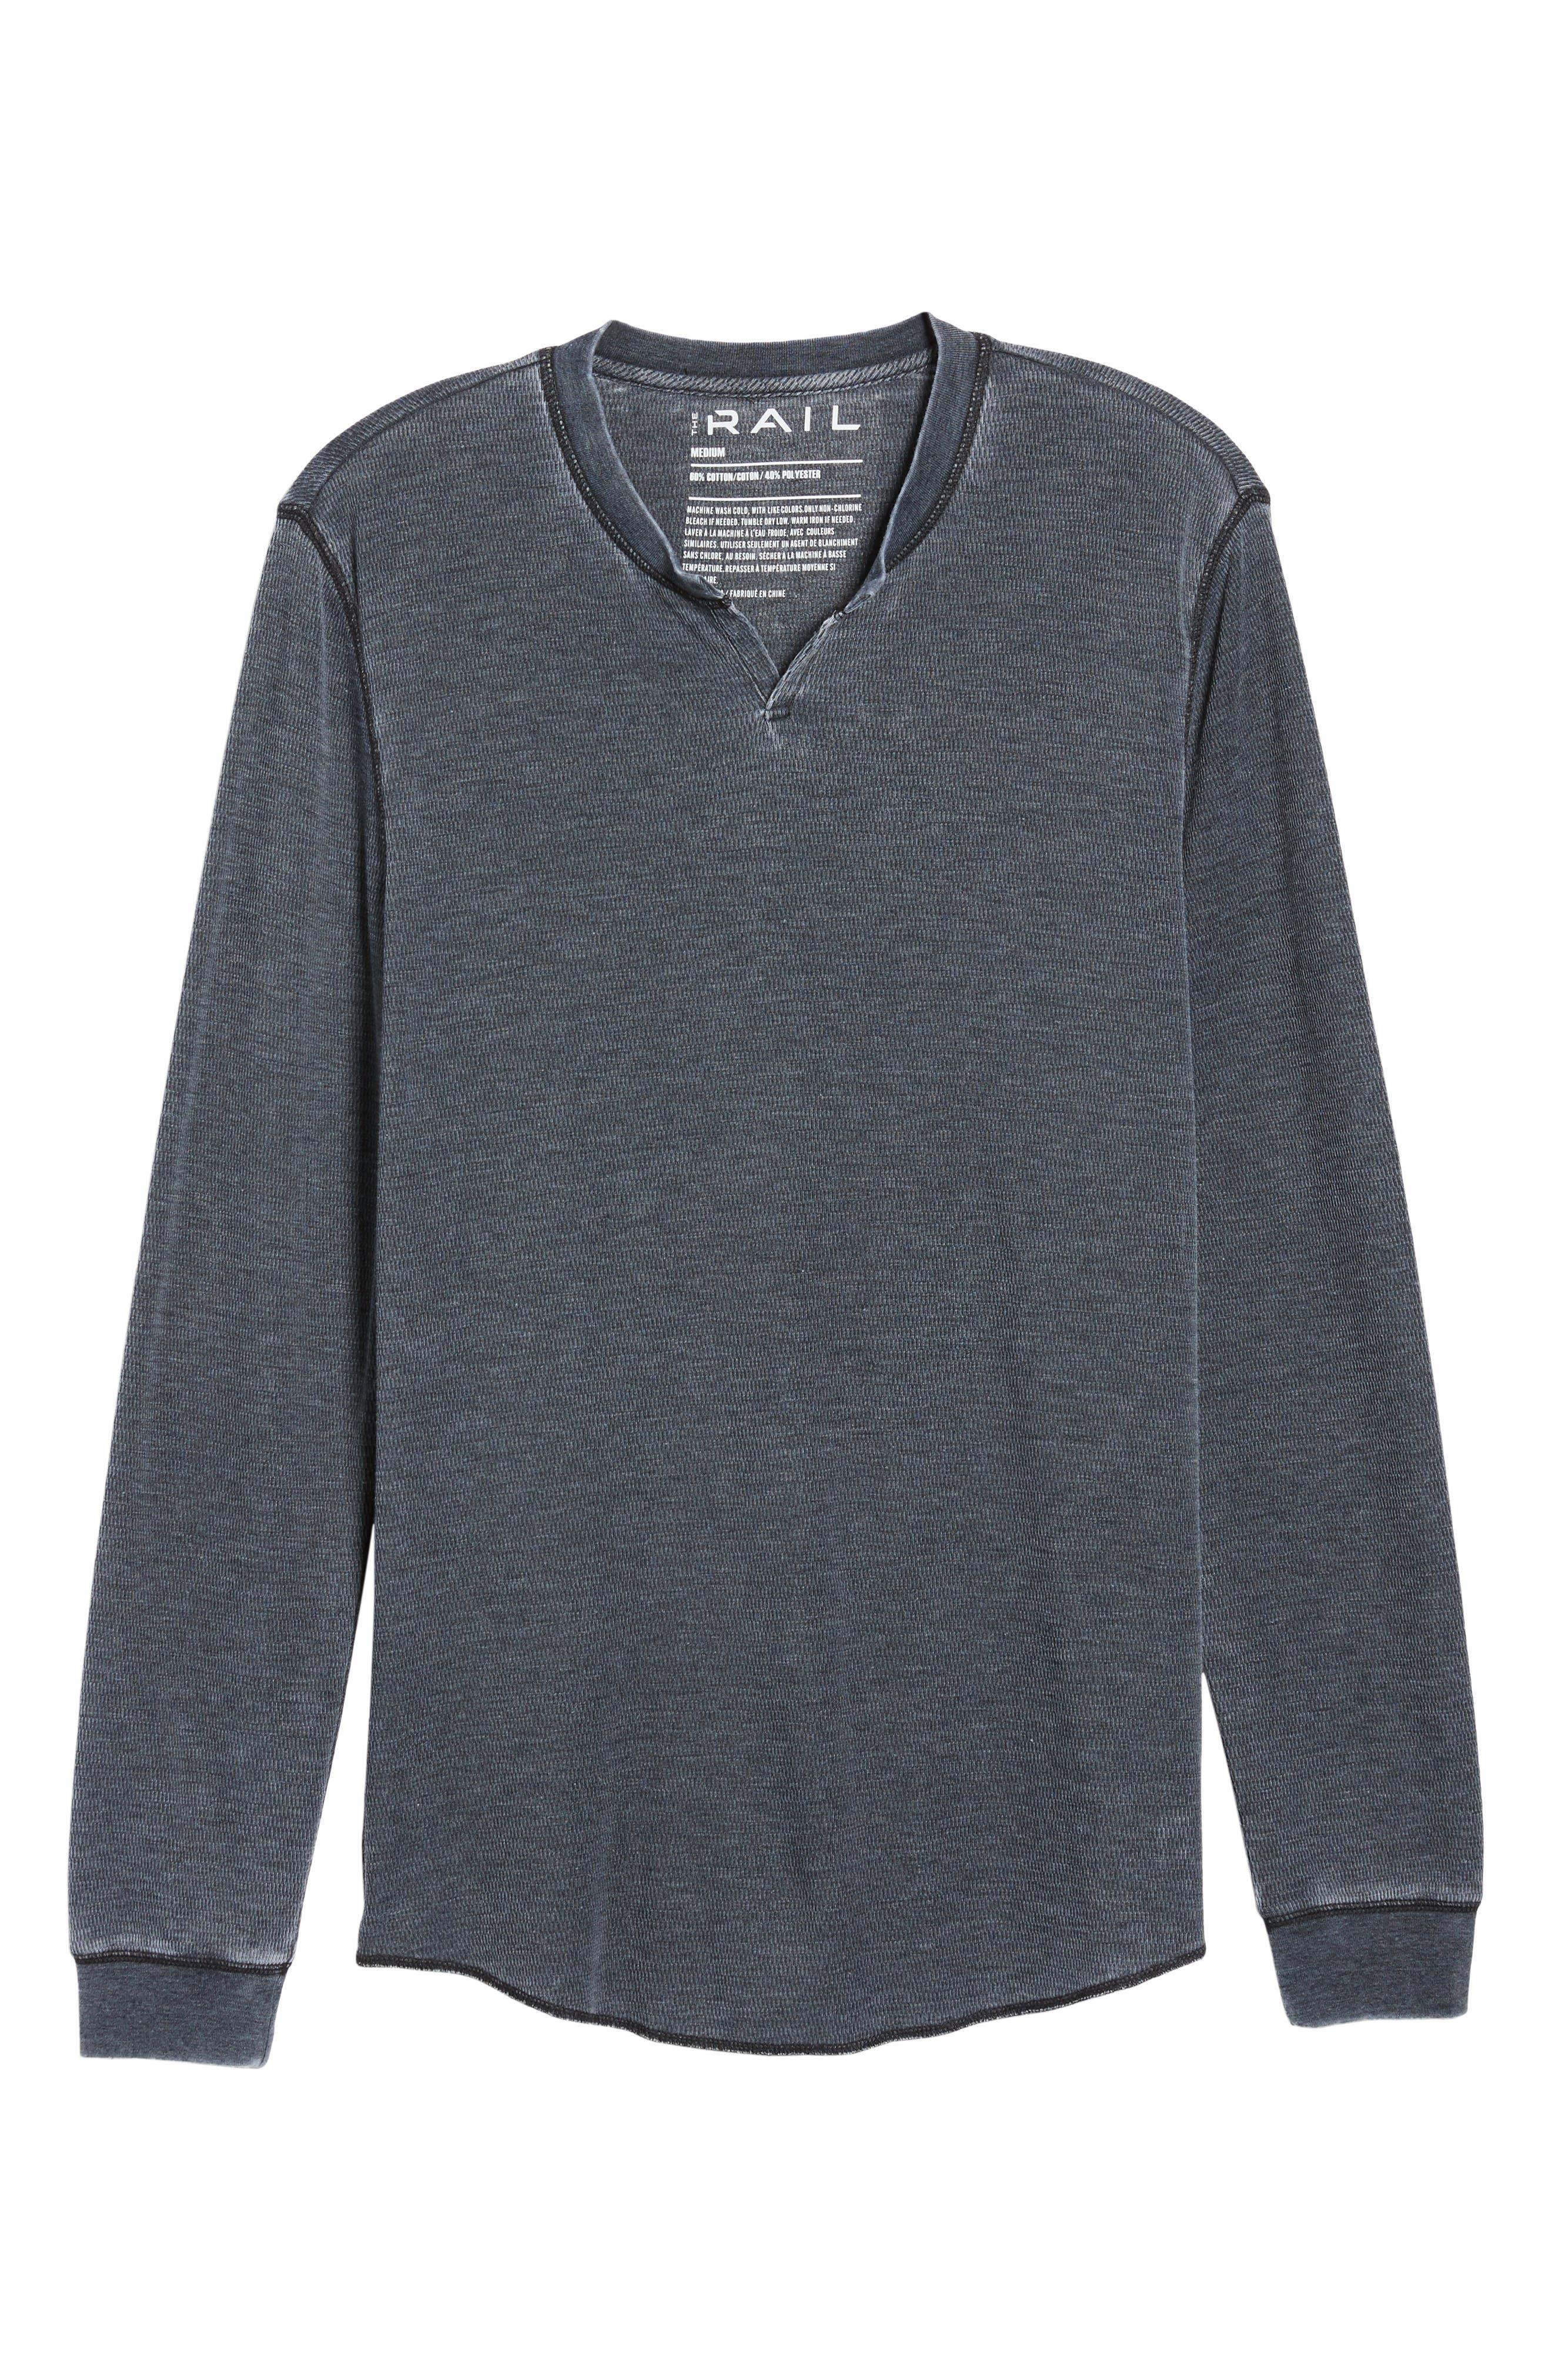 THE RAIL,                             Notch Neck Thermal T-Shirt,                             Alternate thumbnail 6, color,                             001